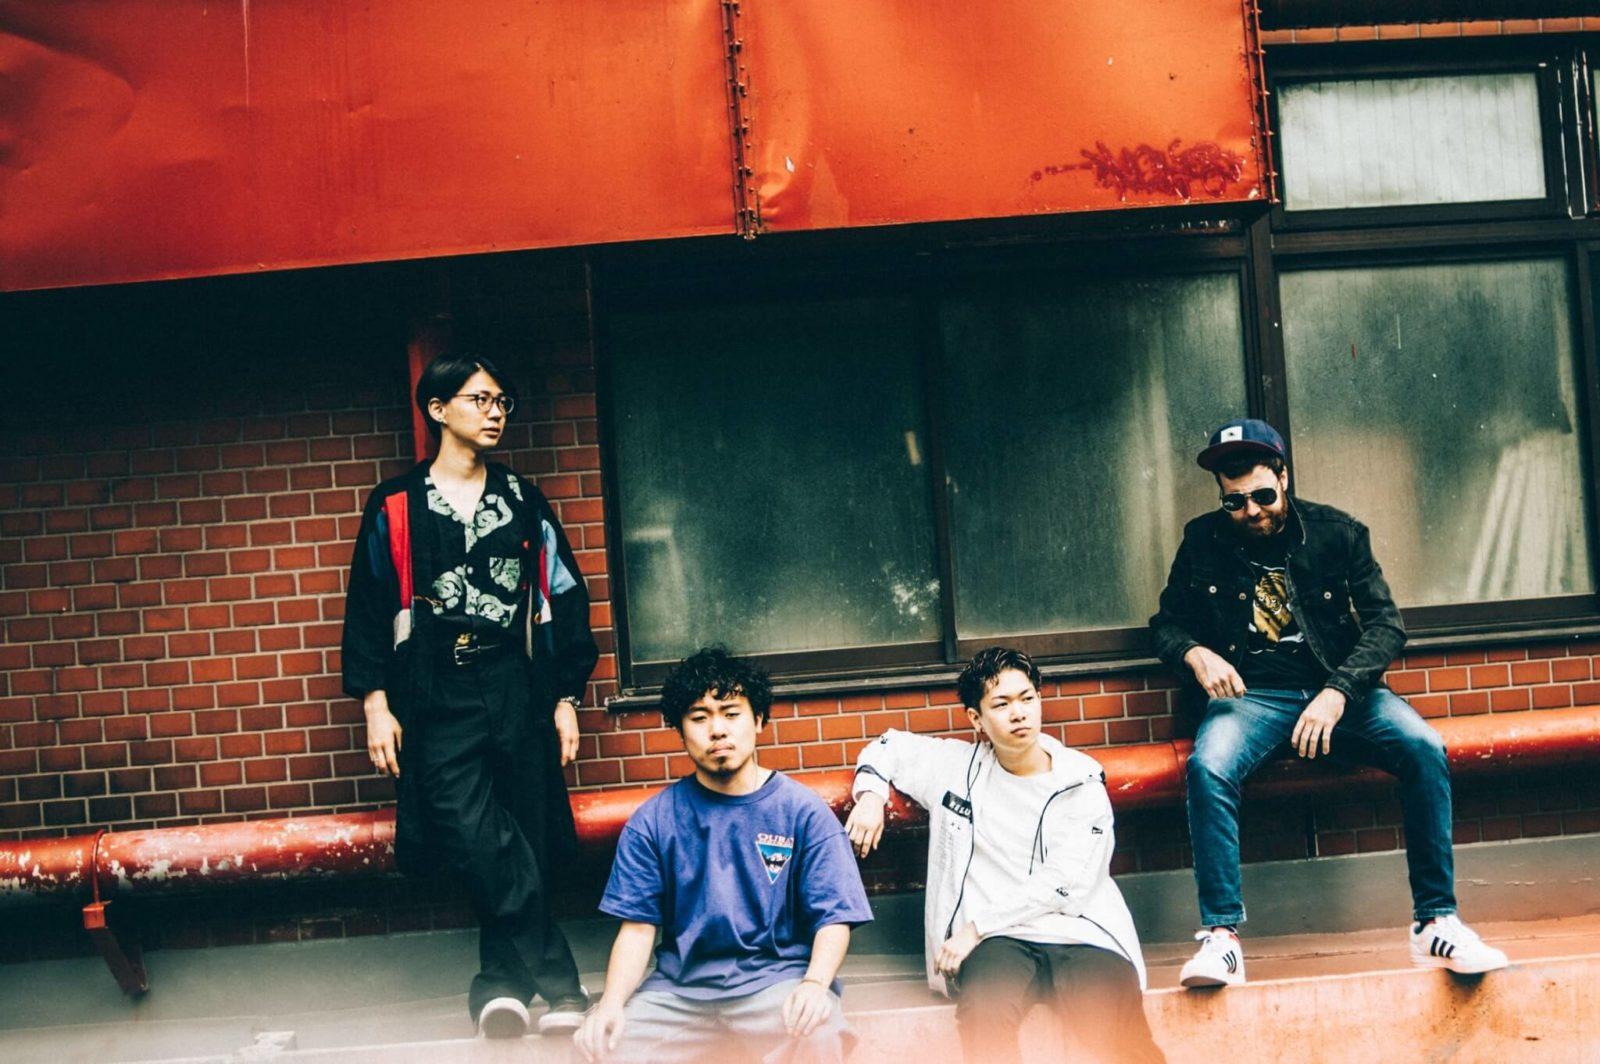 SMTK、1stアルバムリリース、「Otoshi Ana」MVフルバージョン公開サムネイル画像